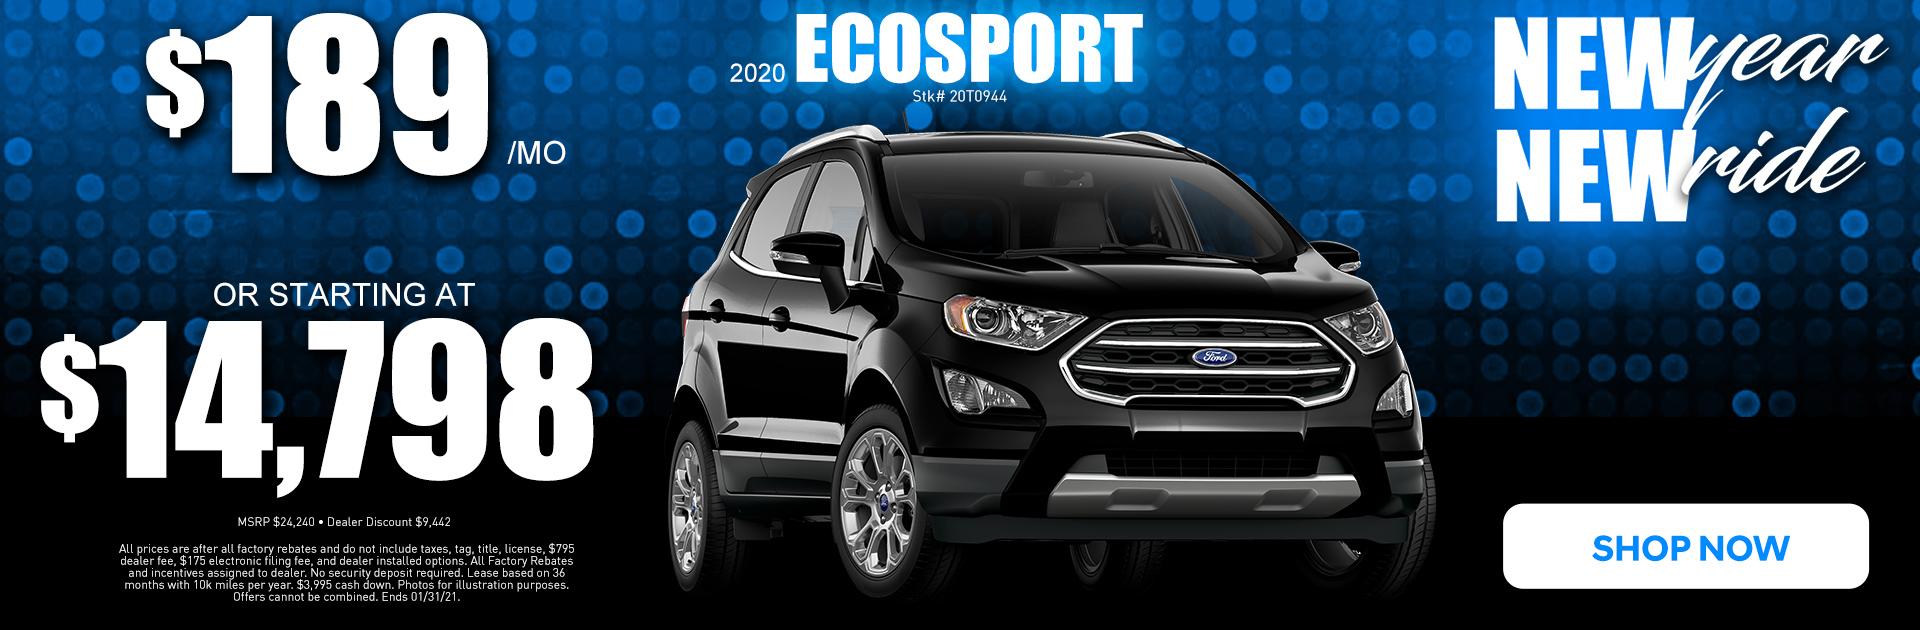 EcoSport